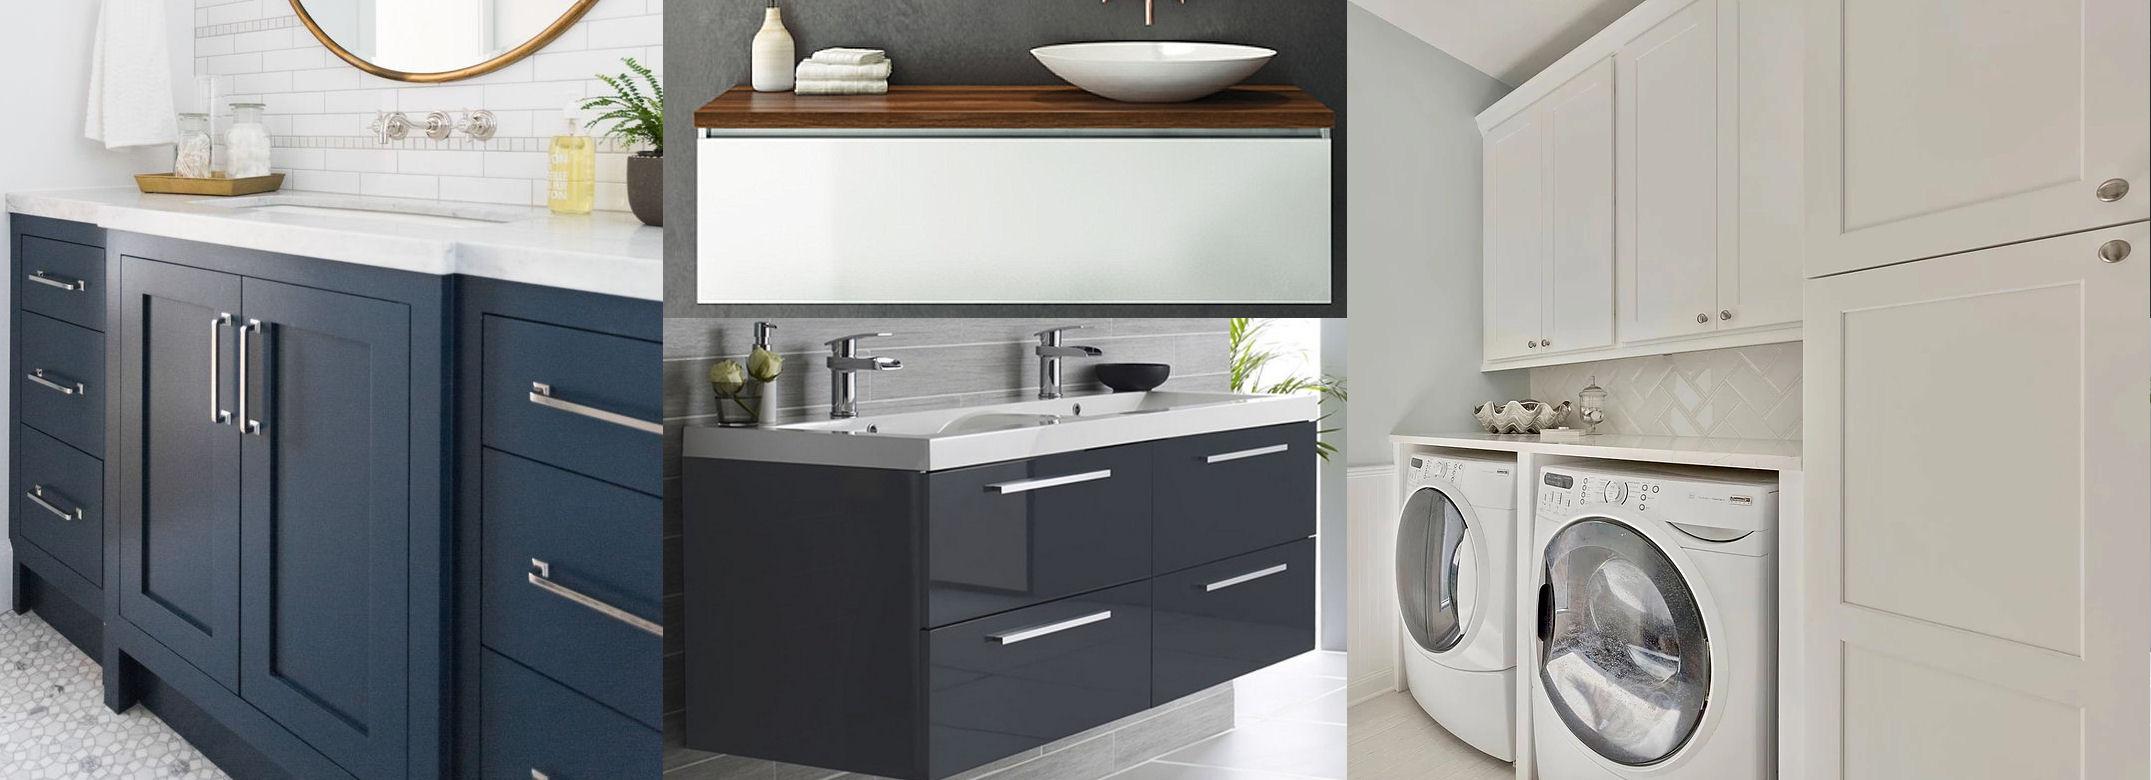 Bathroom And Kitchen Renovations Designer Vanity Units Buy Bathroom Accessories Online